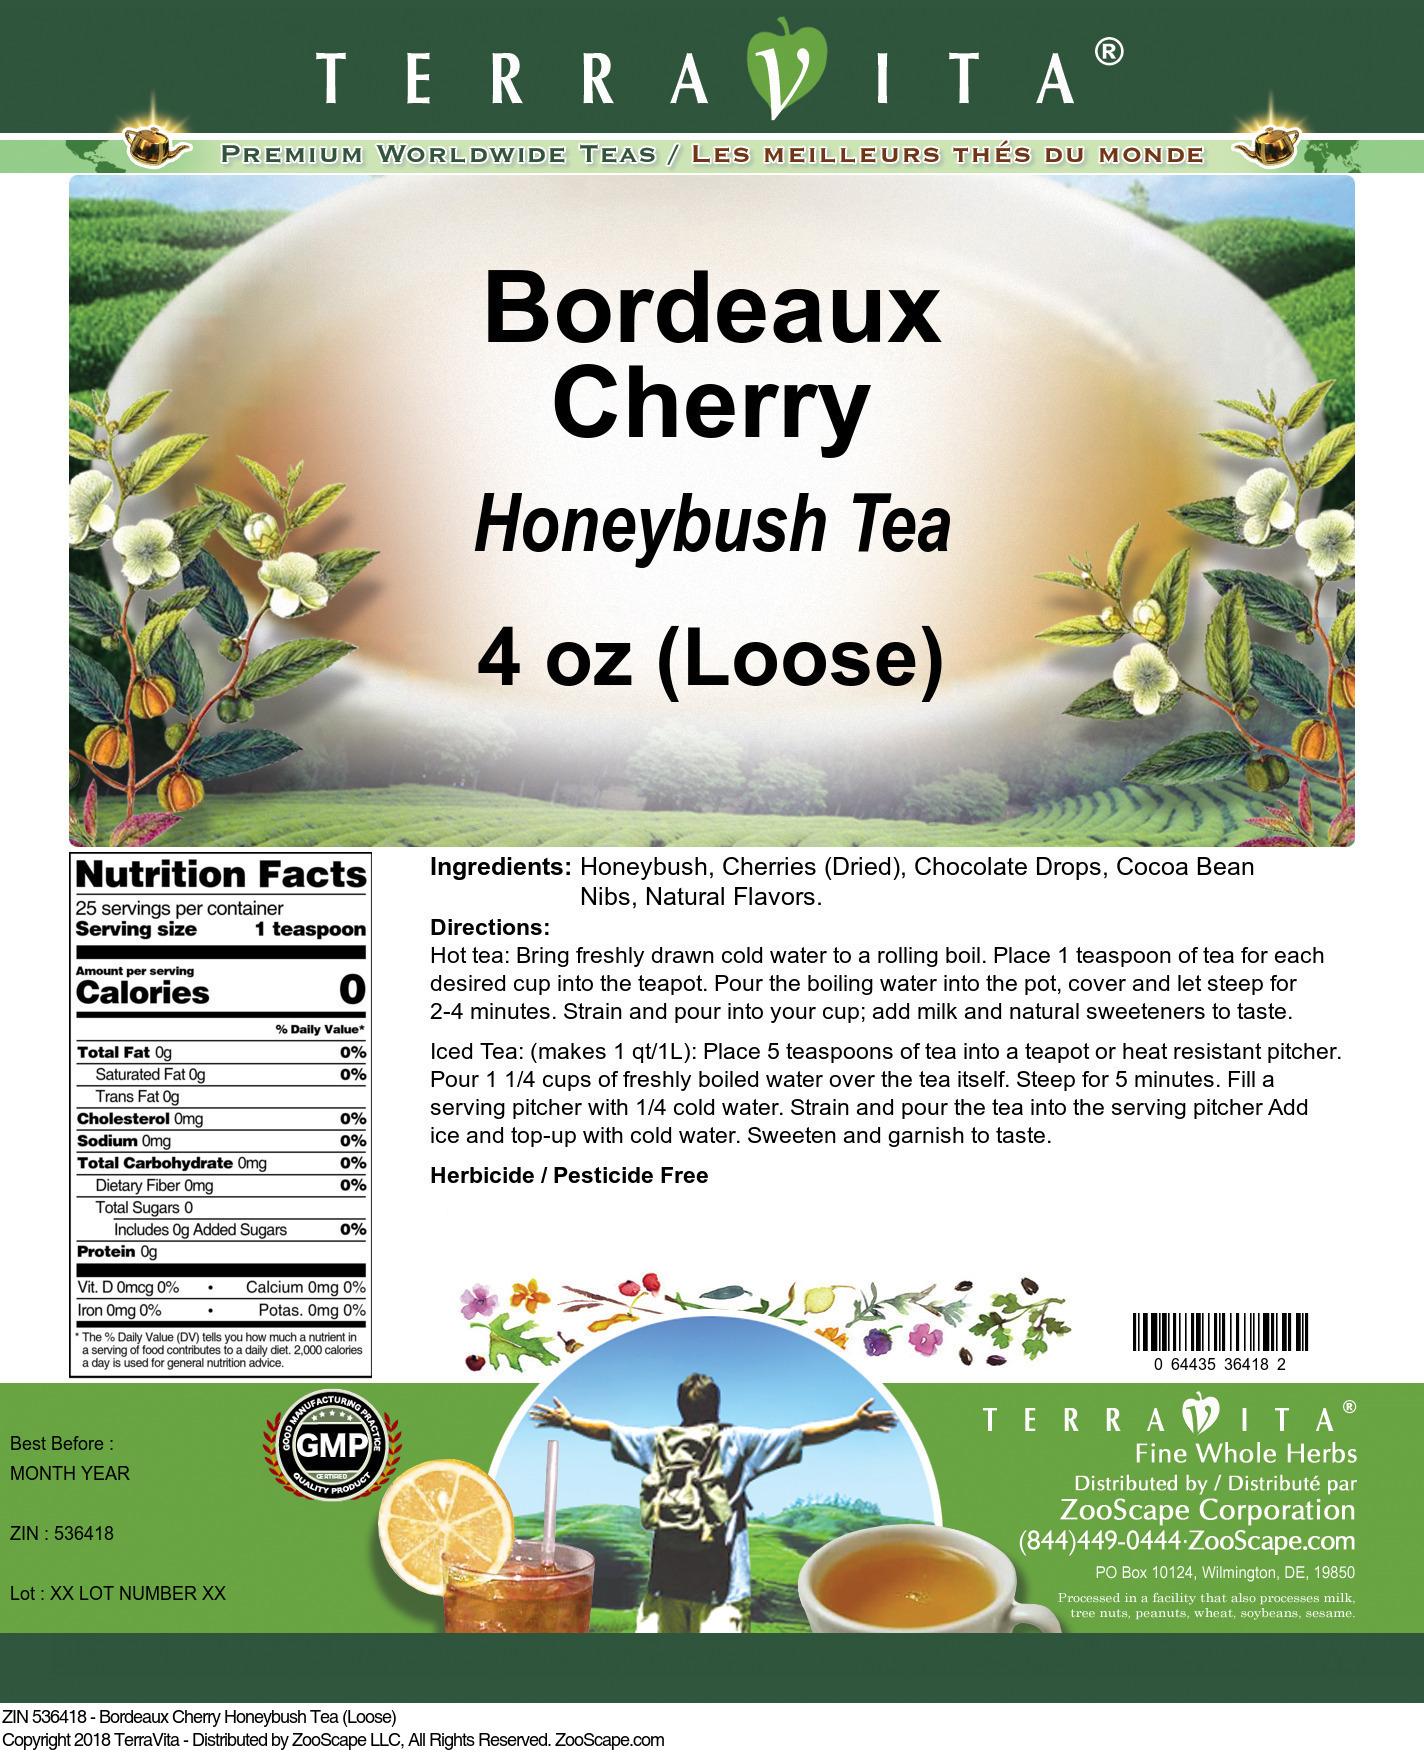 Bordeaux Cherry Honeybush Tea (Loose)